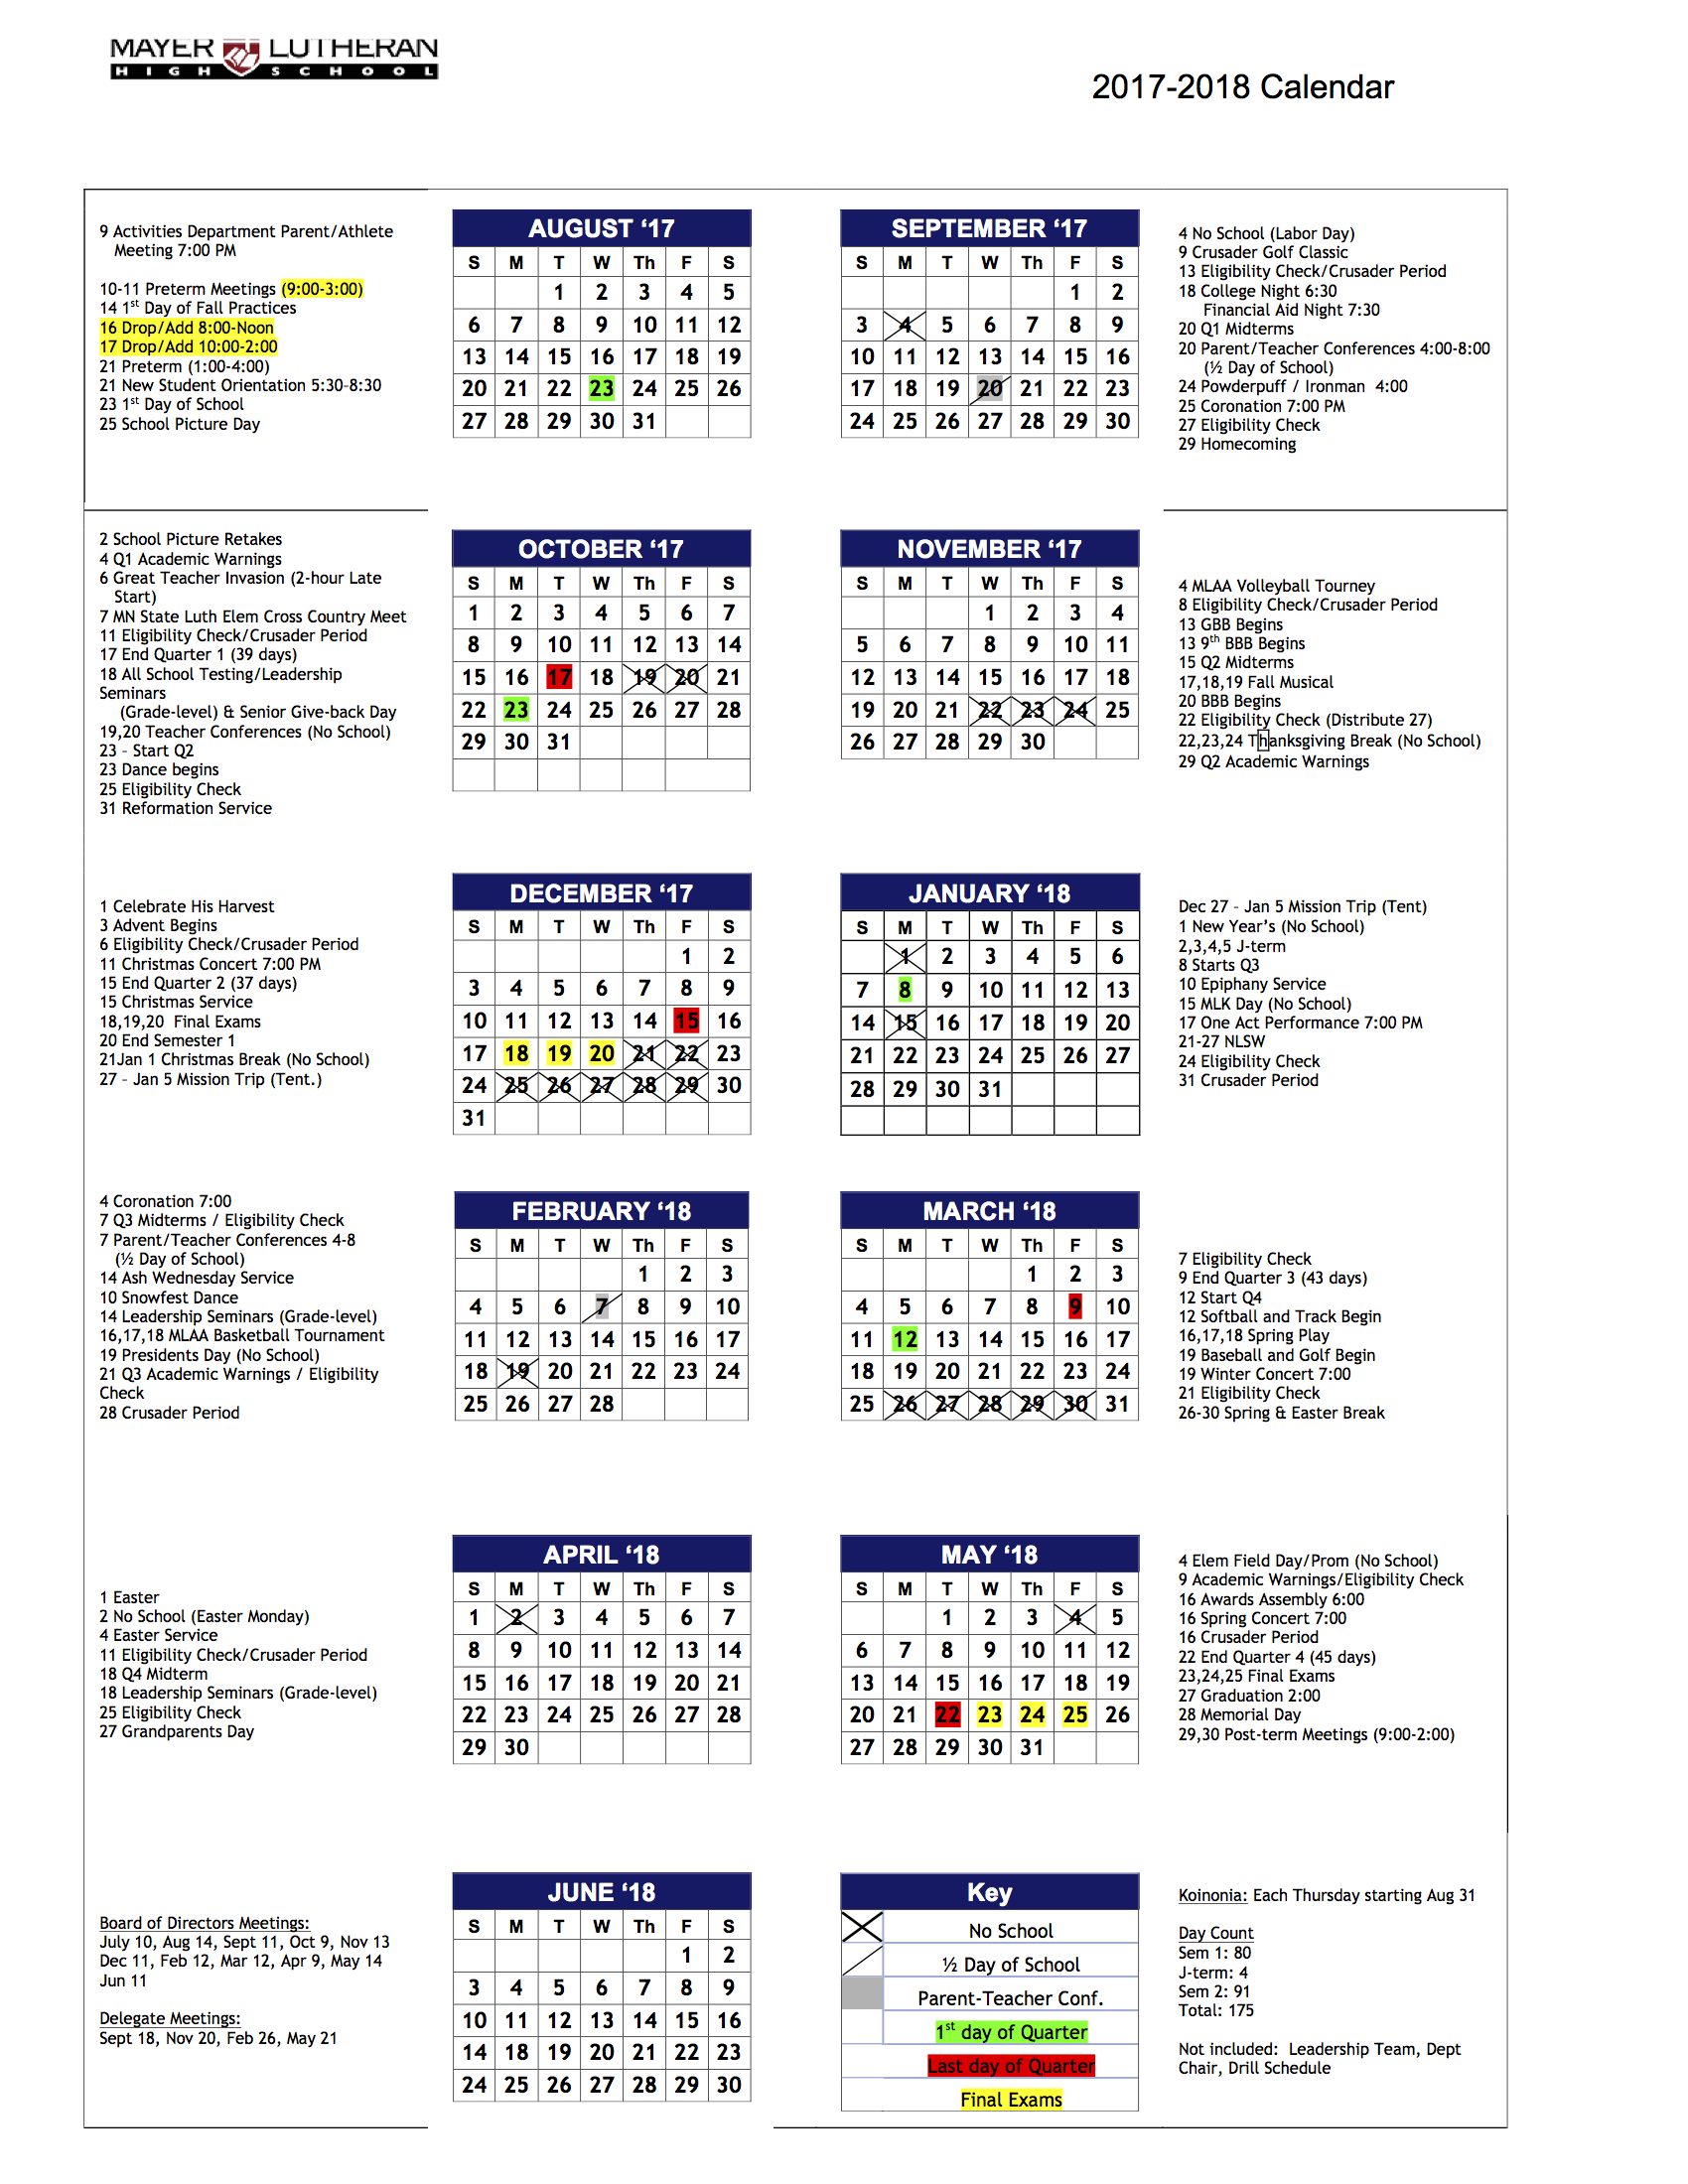 academiccalendar2017 18 - When Does School Start After Christmas Break